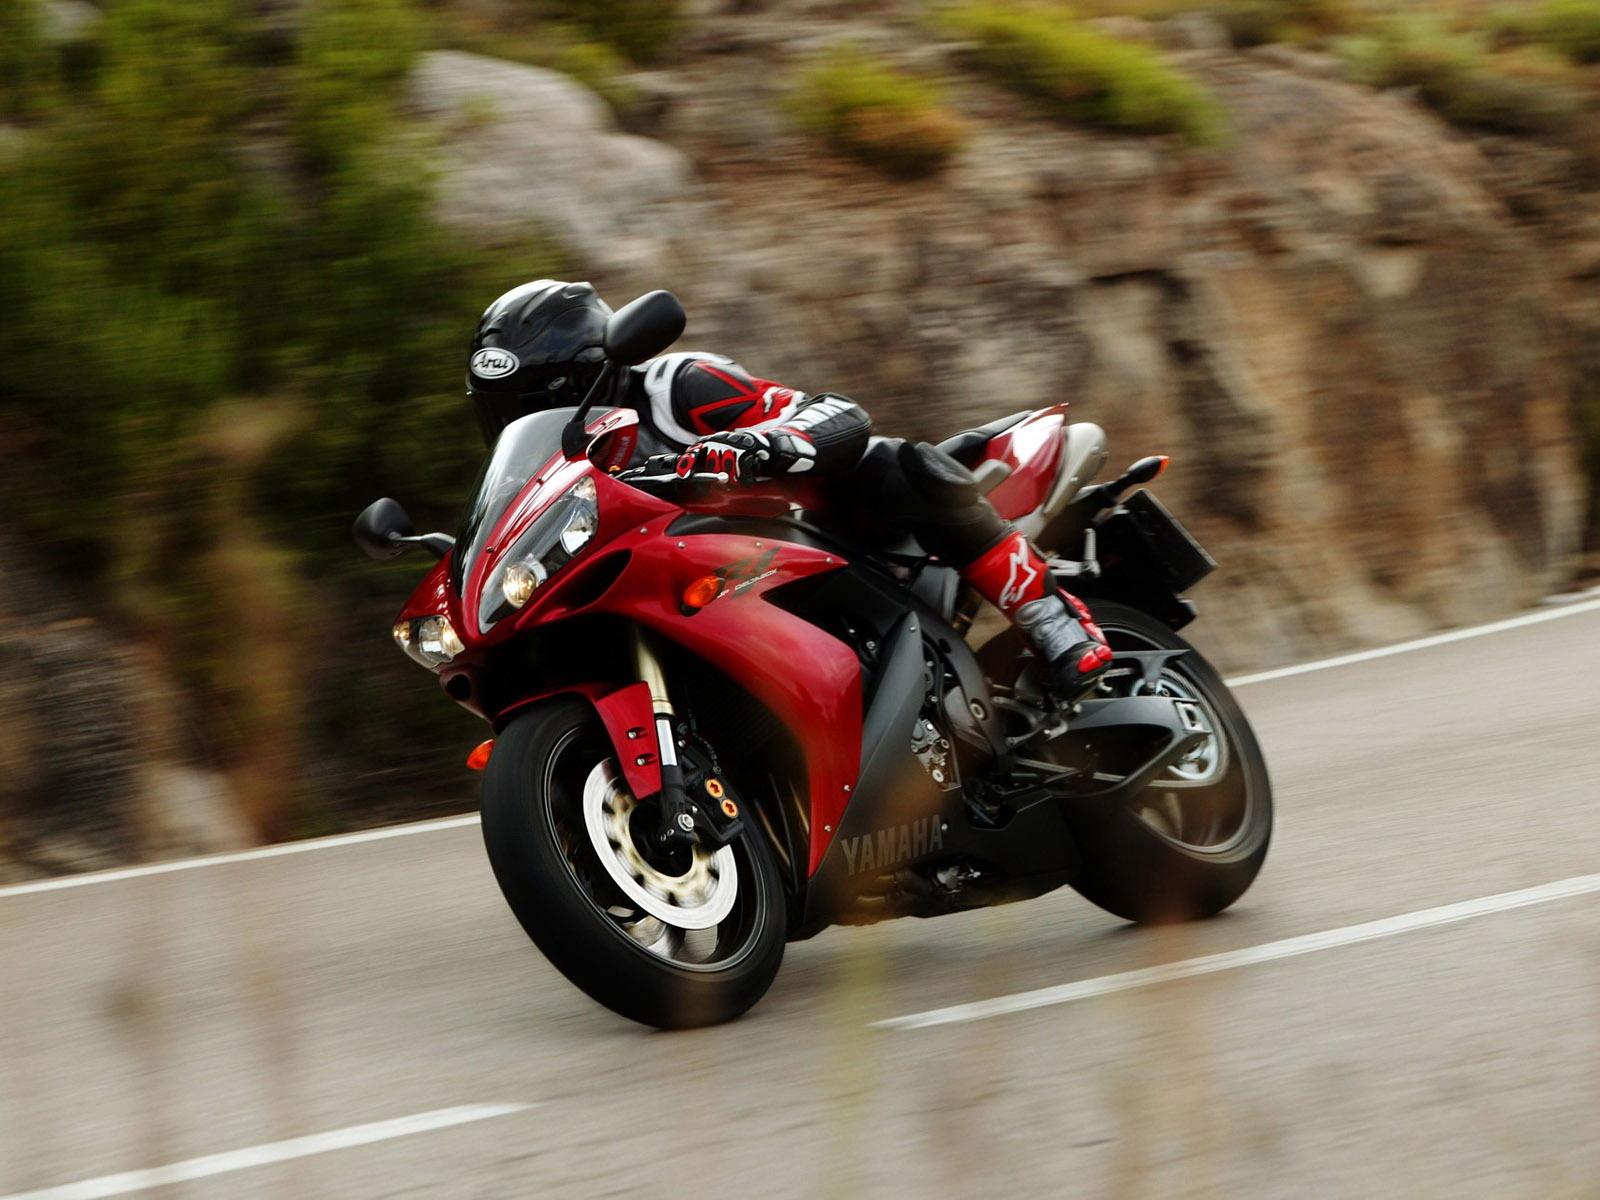 Set As Desktop Background Wallpapers Motocycles Yamaha Bikes